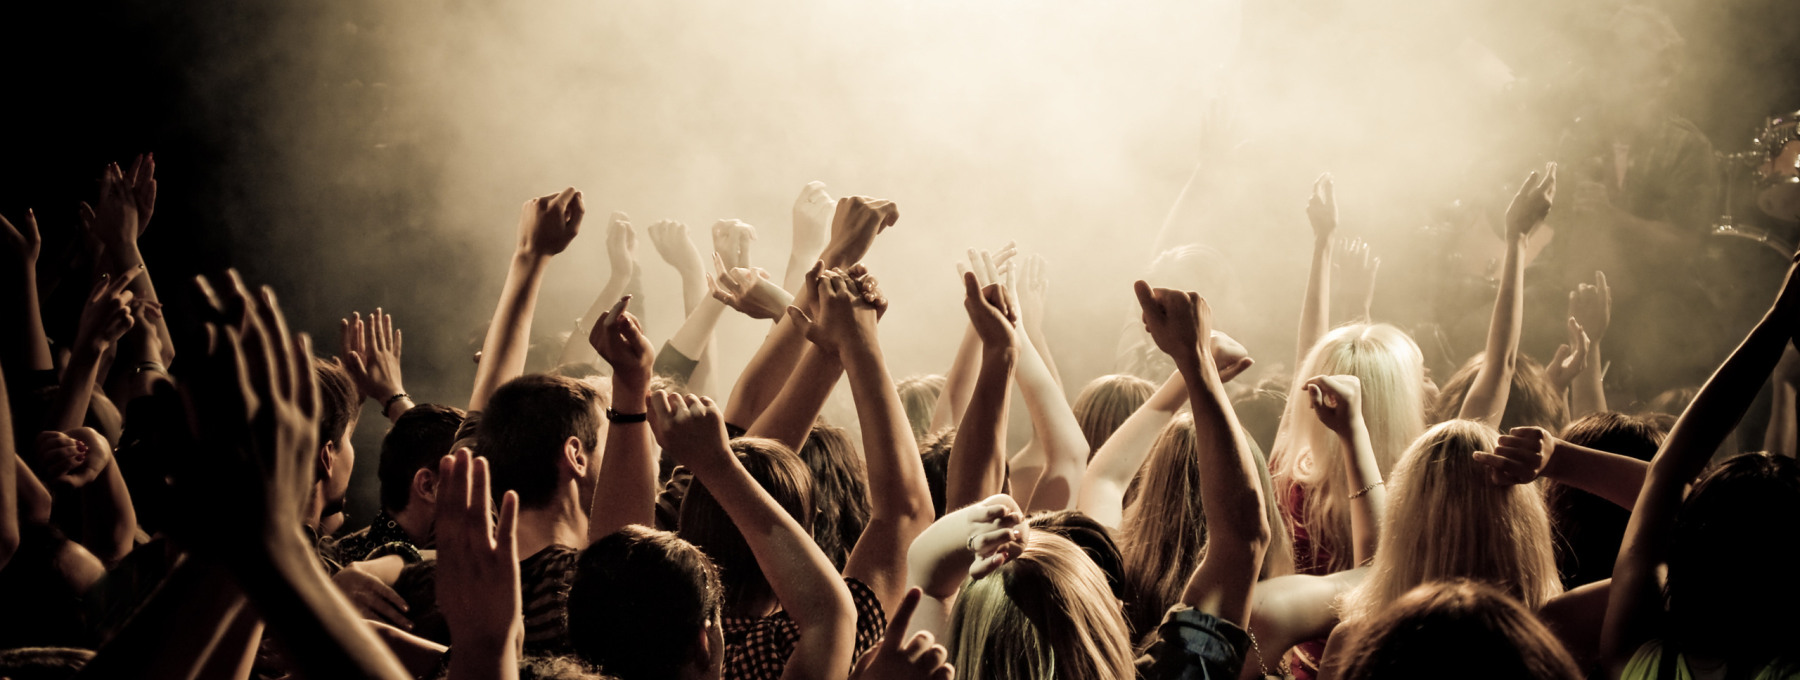 Social Media Marketing for Music